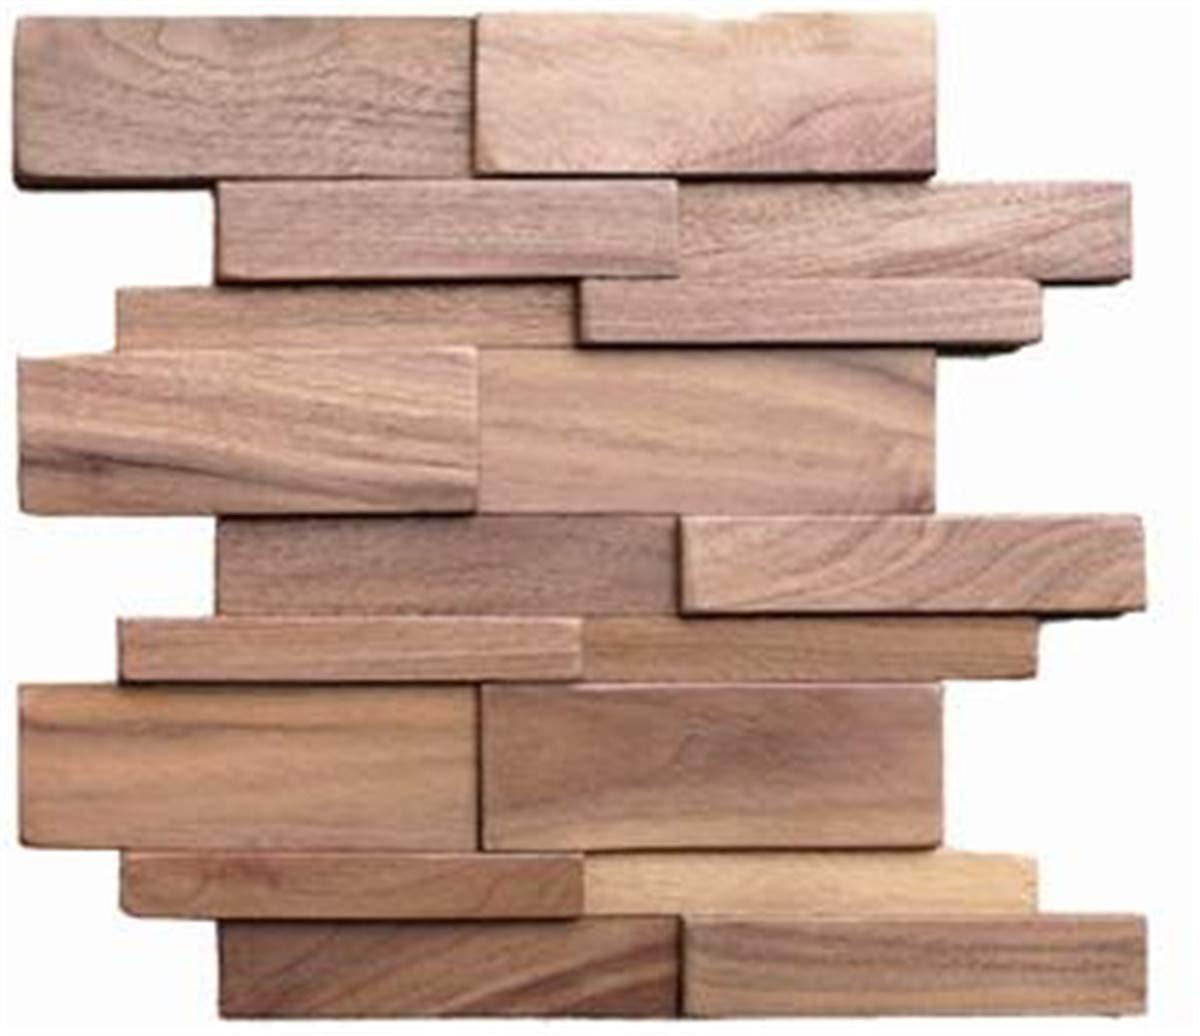 Amazoncom Solid Black Walnut Wood Wall Panel For Diy Wall Planks